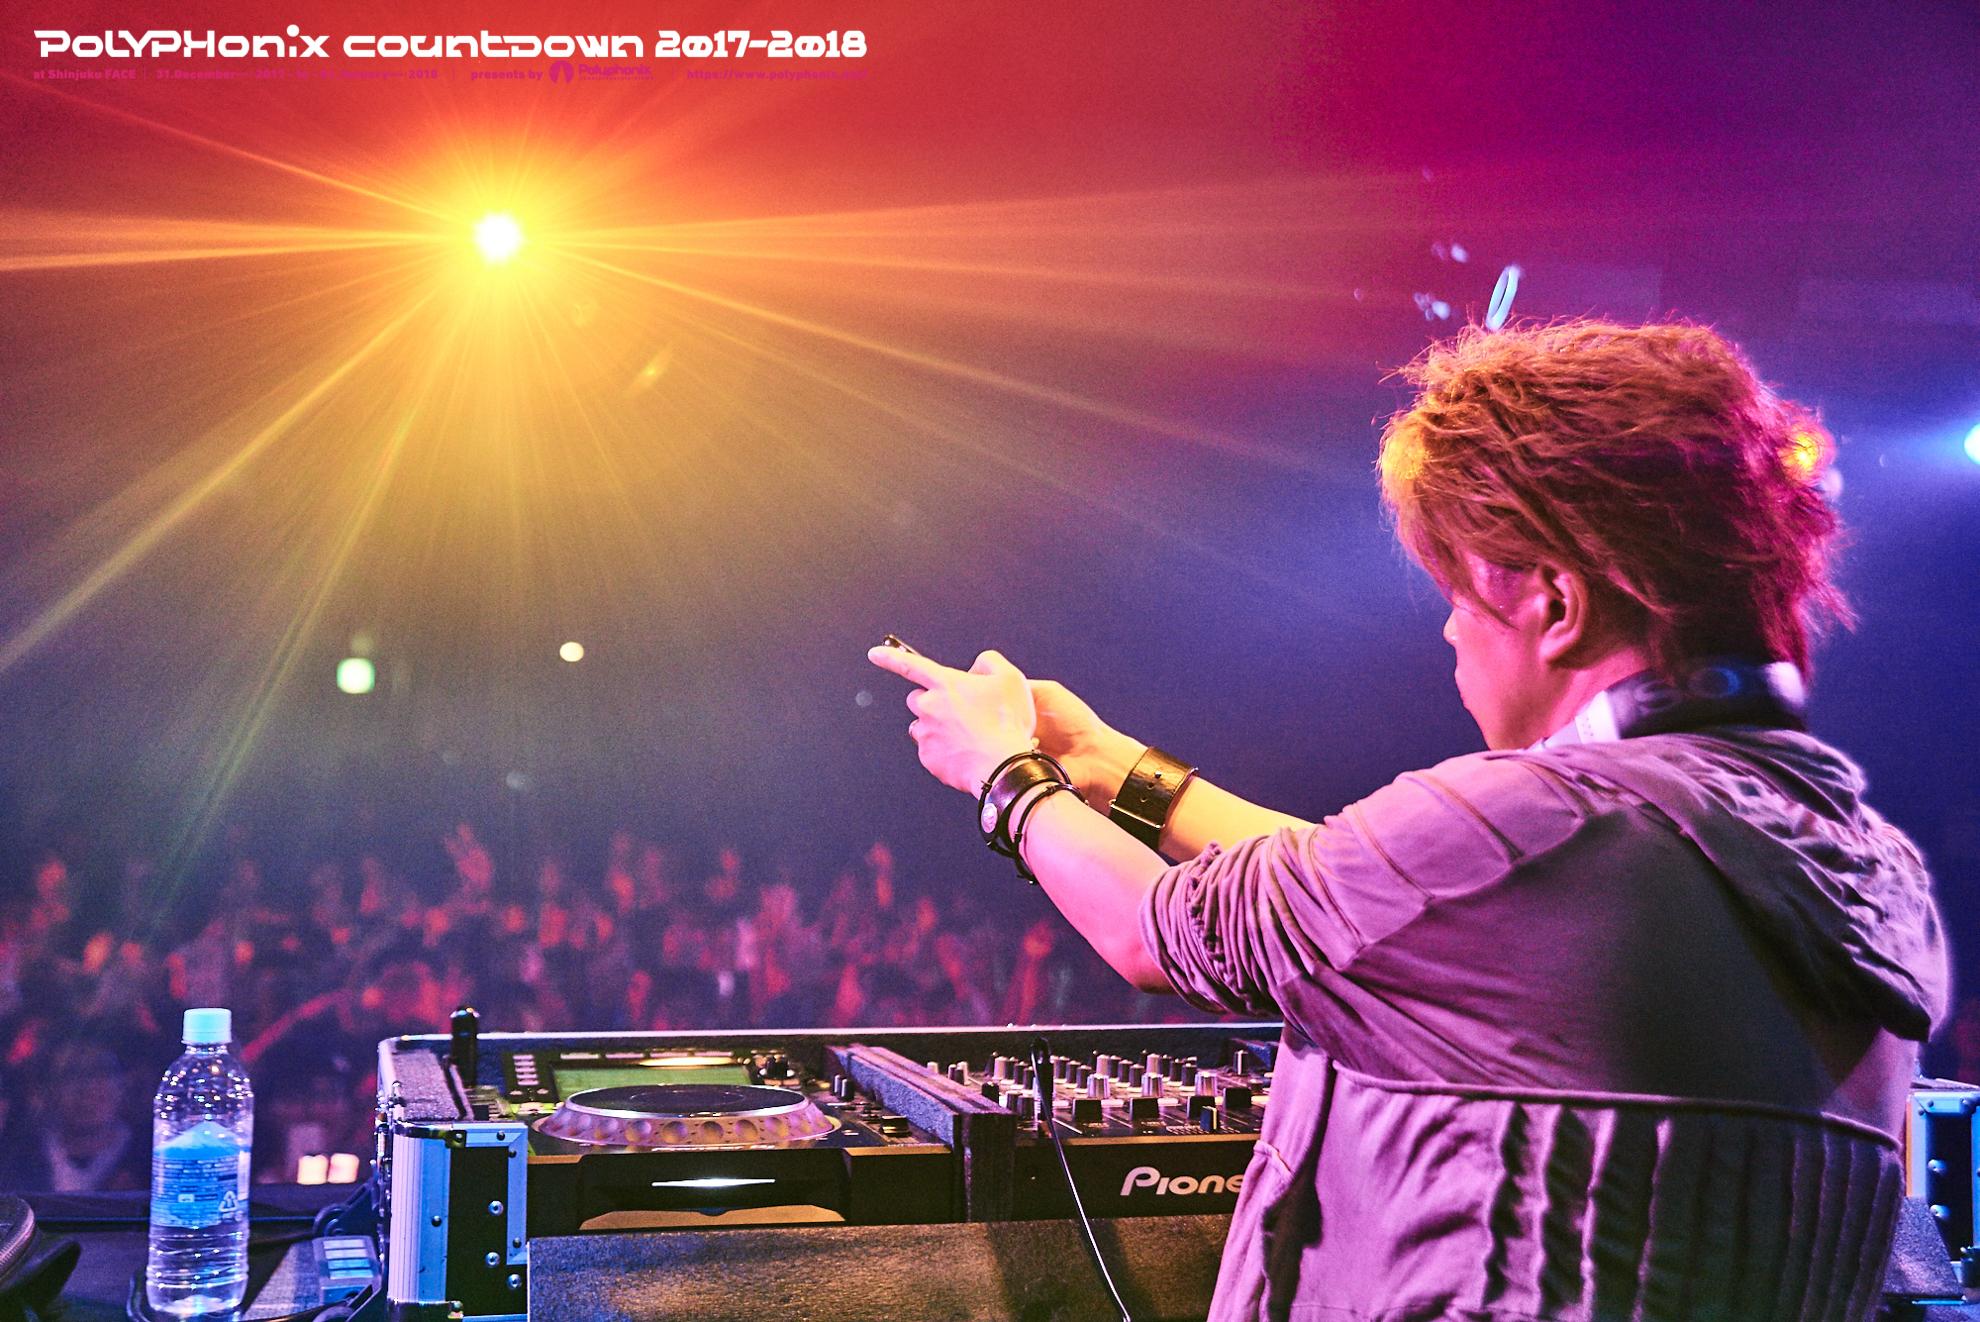 polyphonixcountdown_2017_2018-24